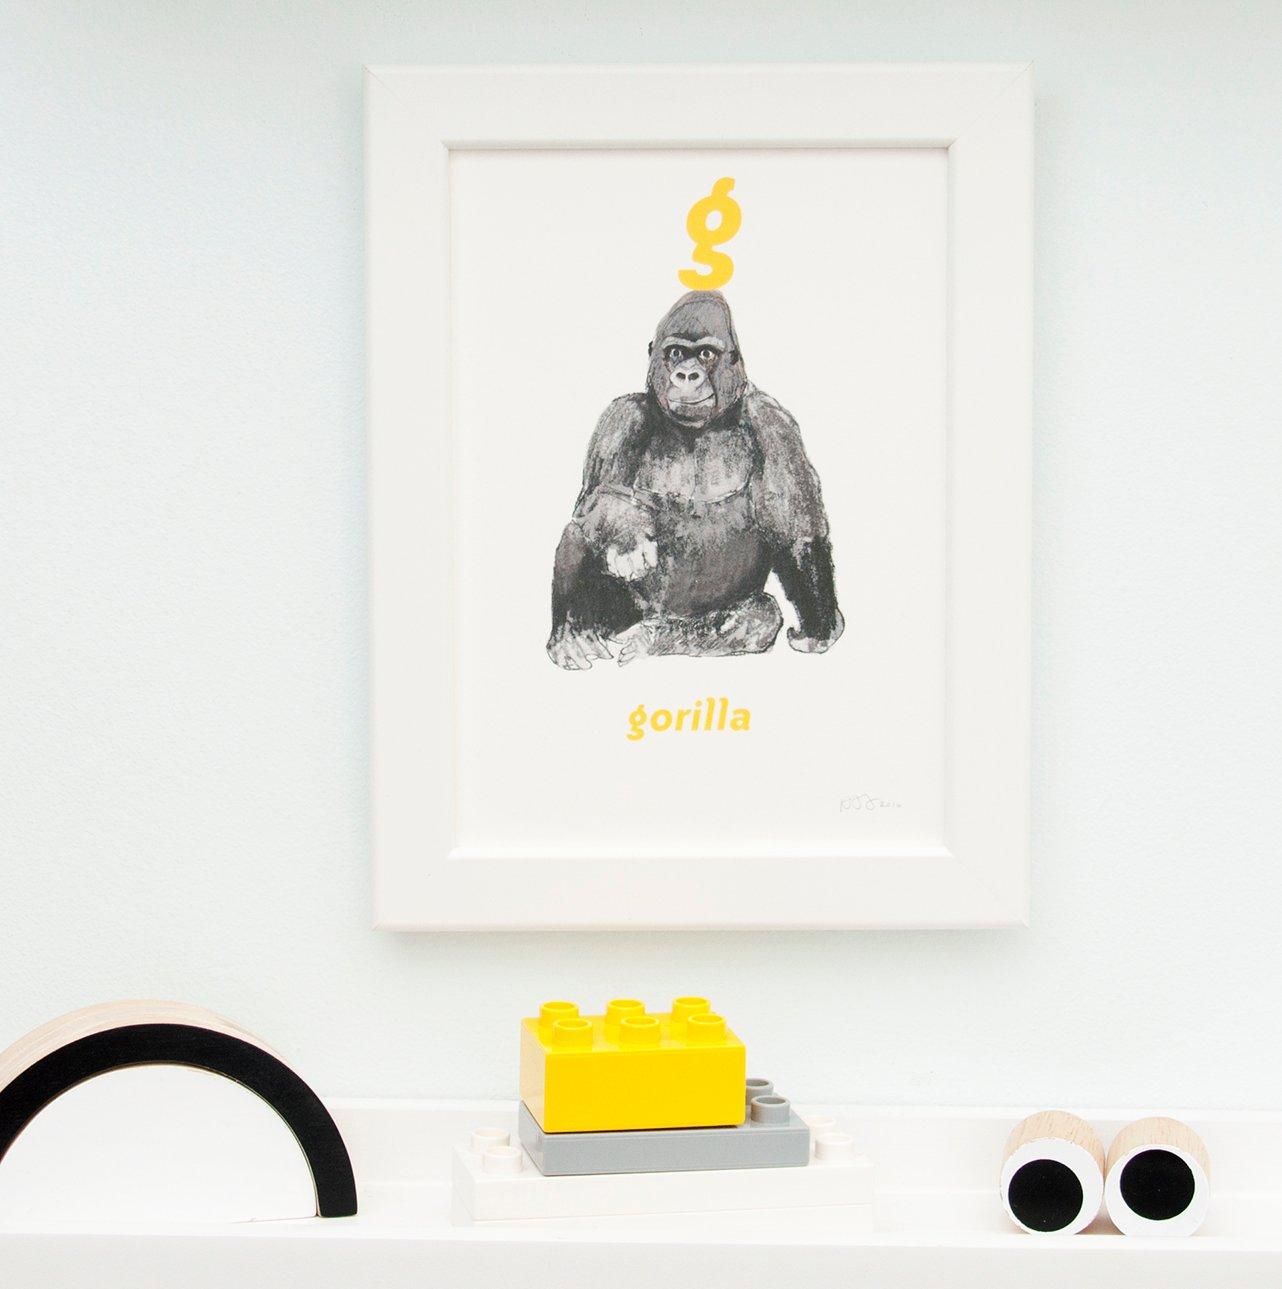 Image of G - Gorilla Letter Print